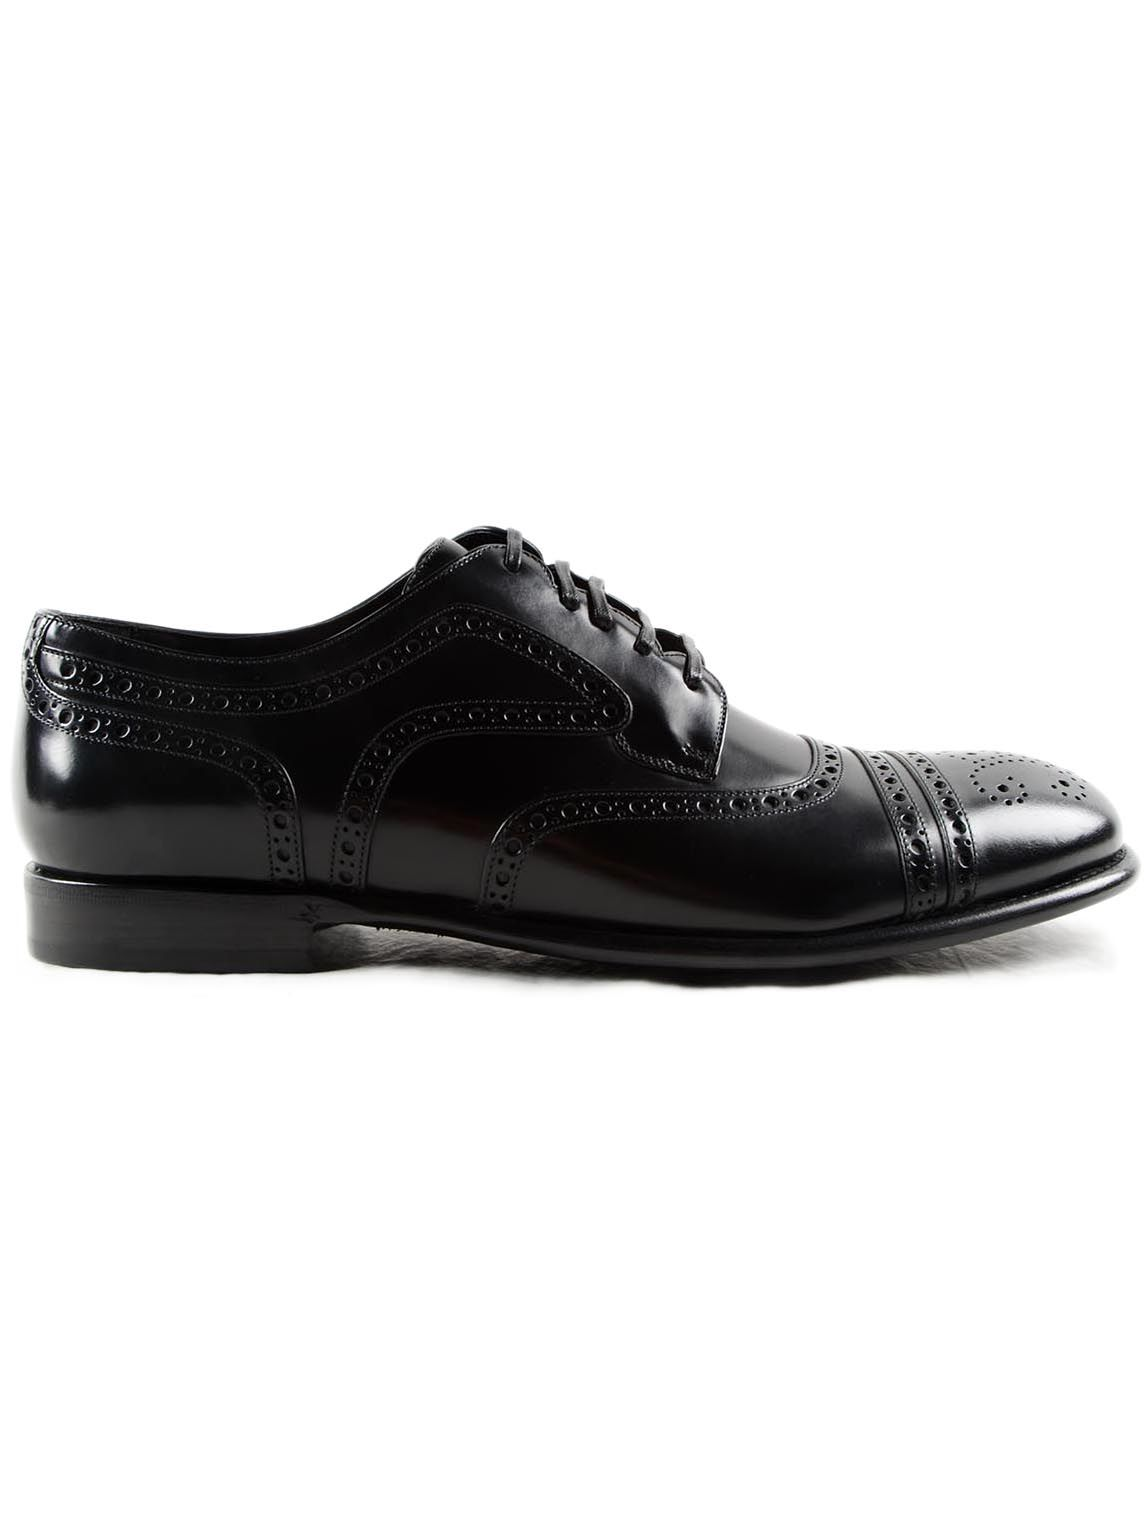 Dolce & Gabbana Dolce & Gabbana Classic Brogues Derby Shoes